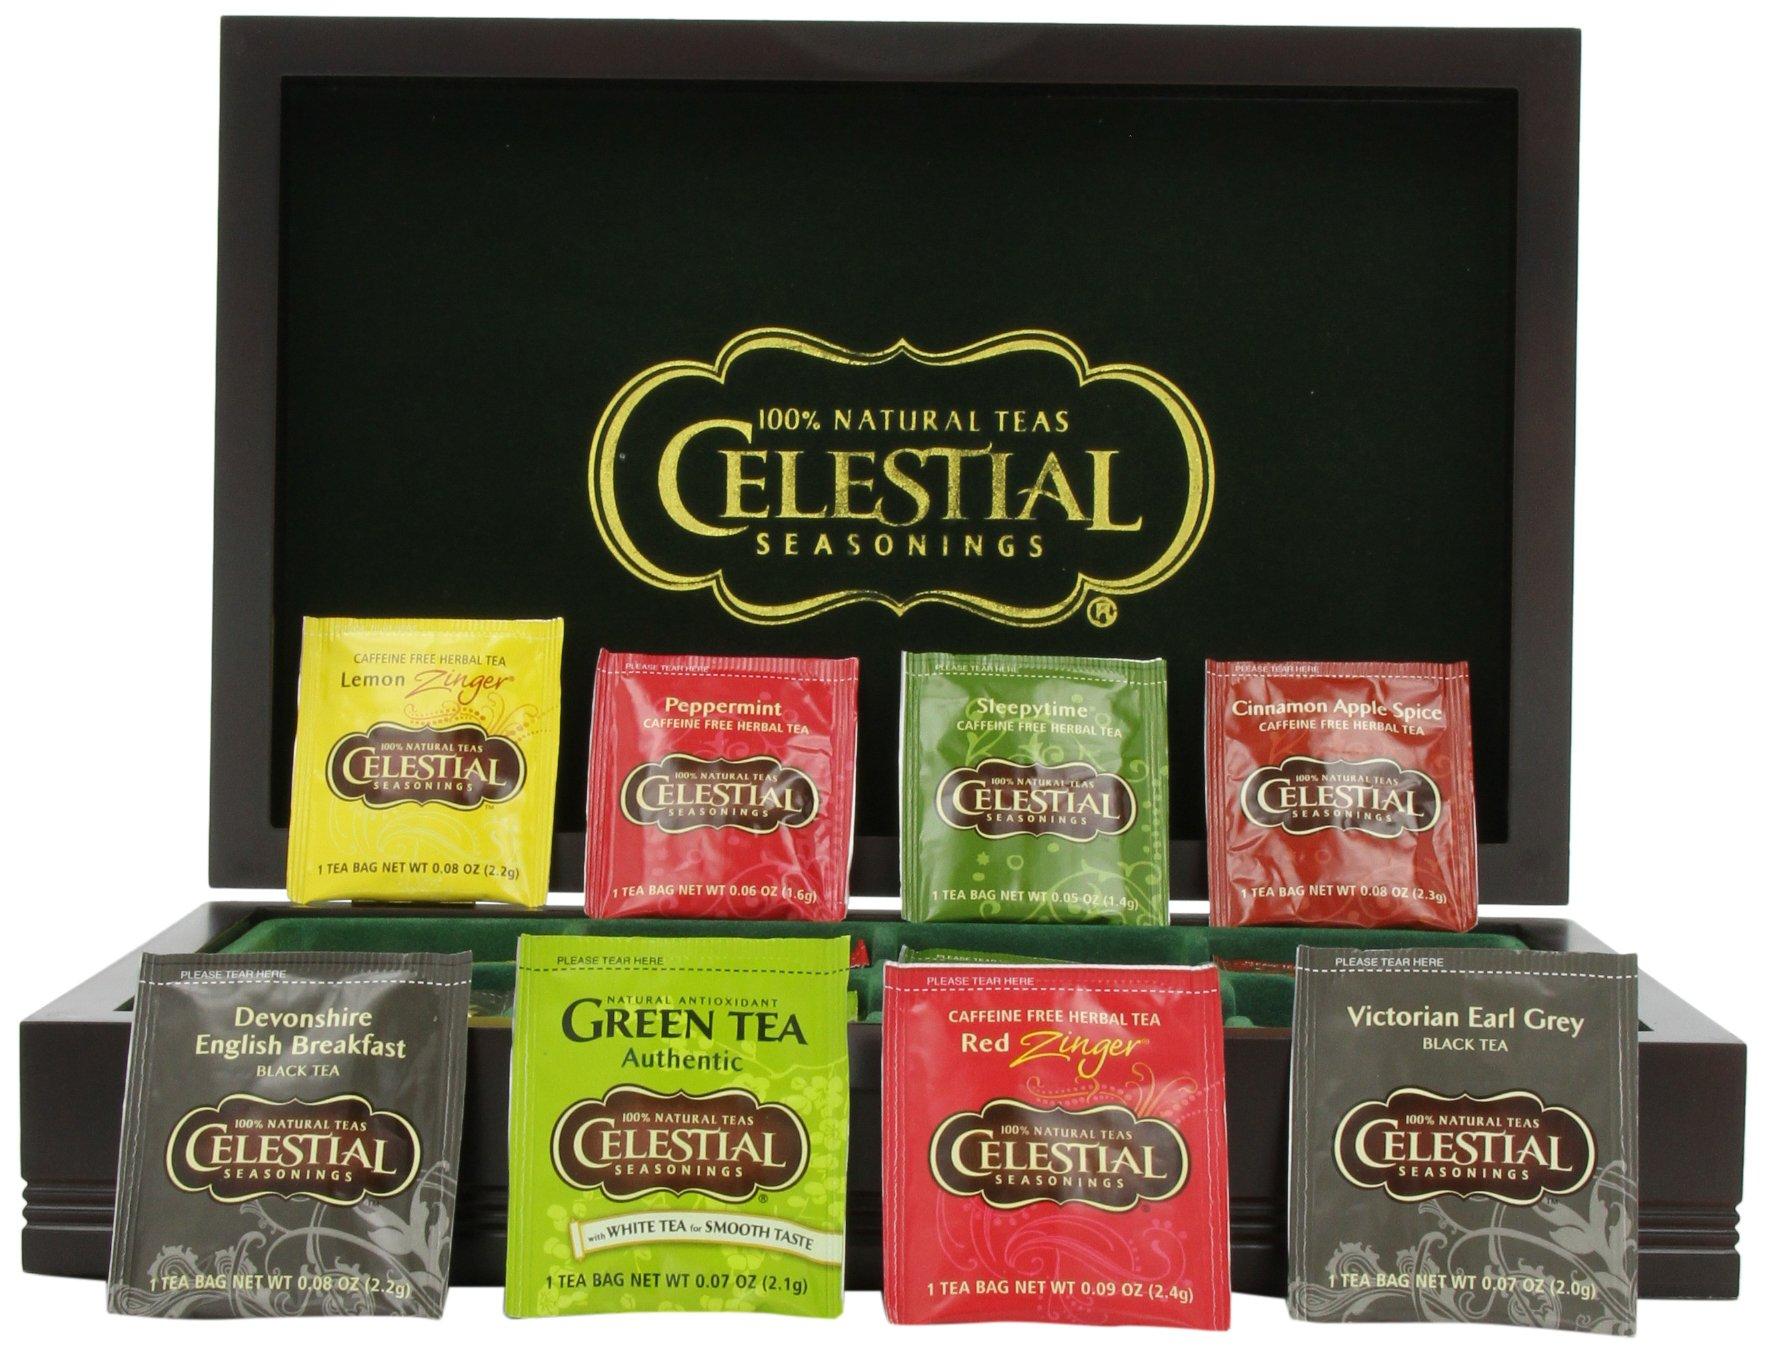 Celestial Seasonings Wooden Chest with Tea, 64 Count by Celestial Seasonings